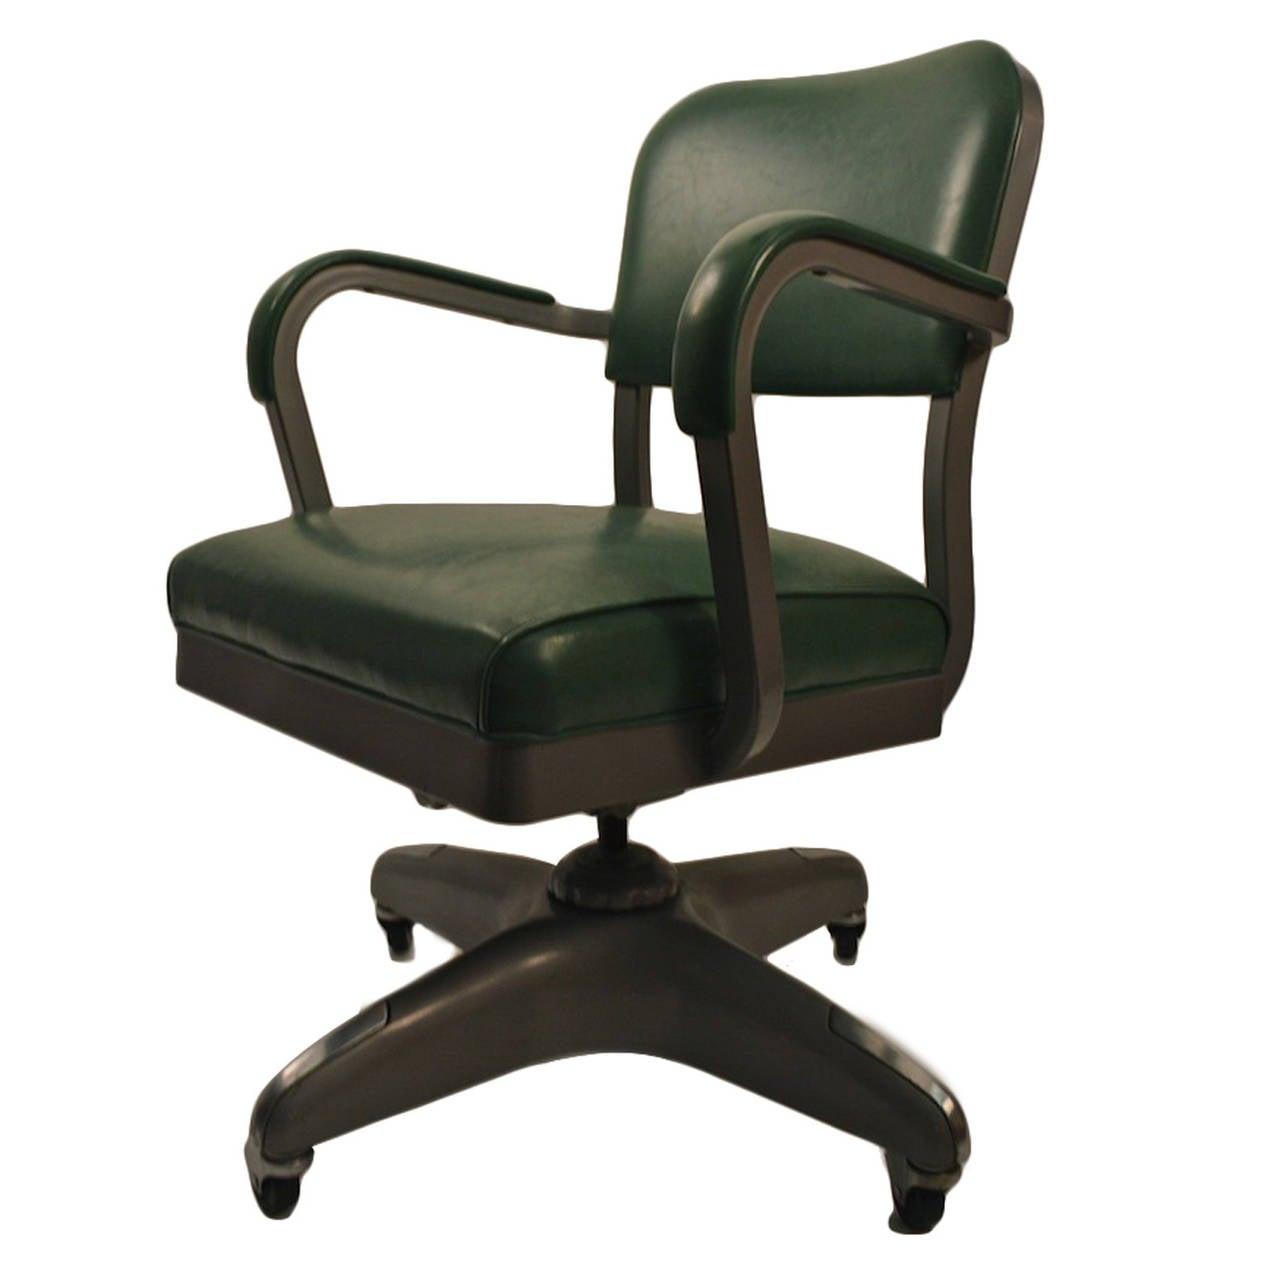 classic swivel tilt industrial office chair at 1stdibs. Black Bedroom Furniture Sets. Home Design Ideas